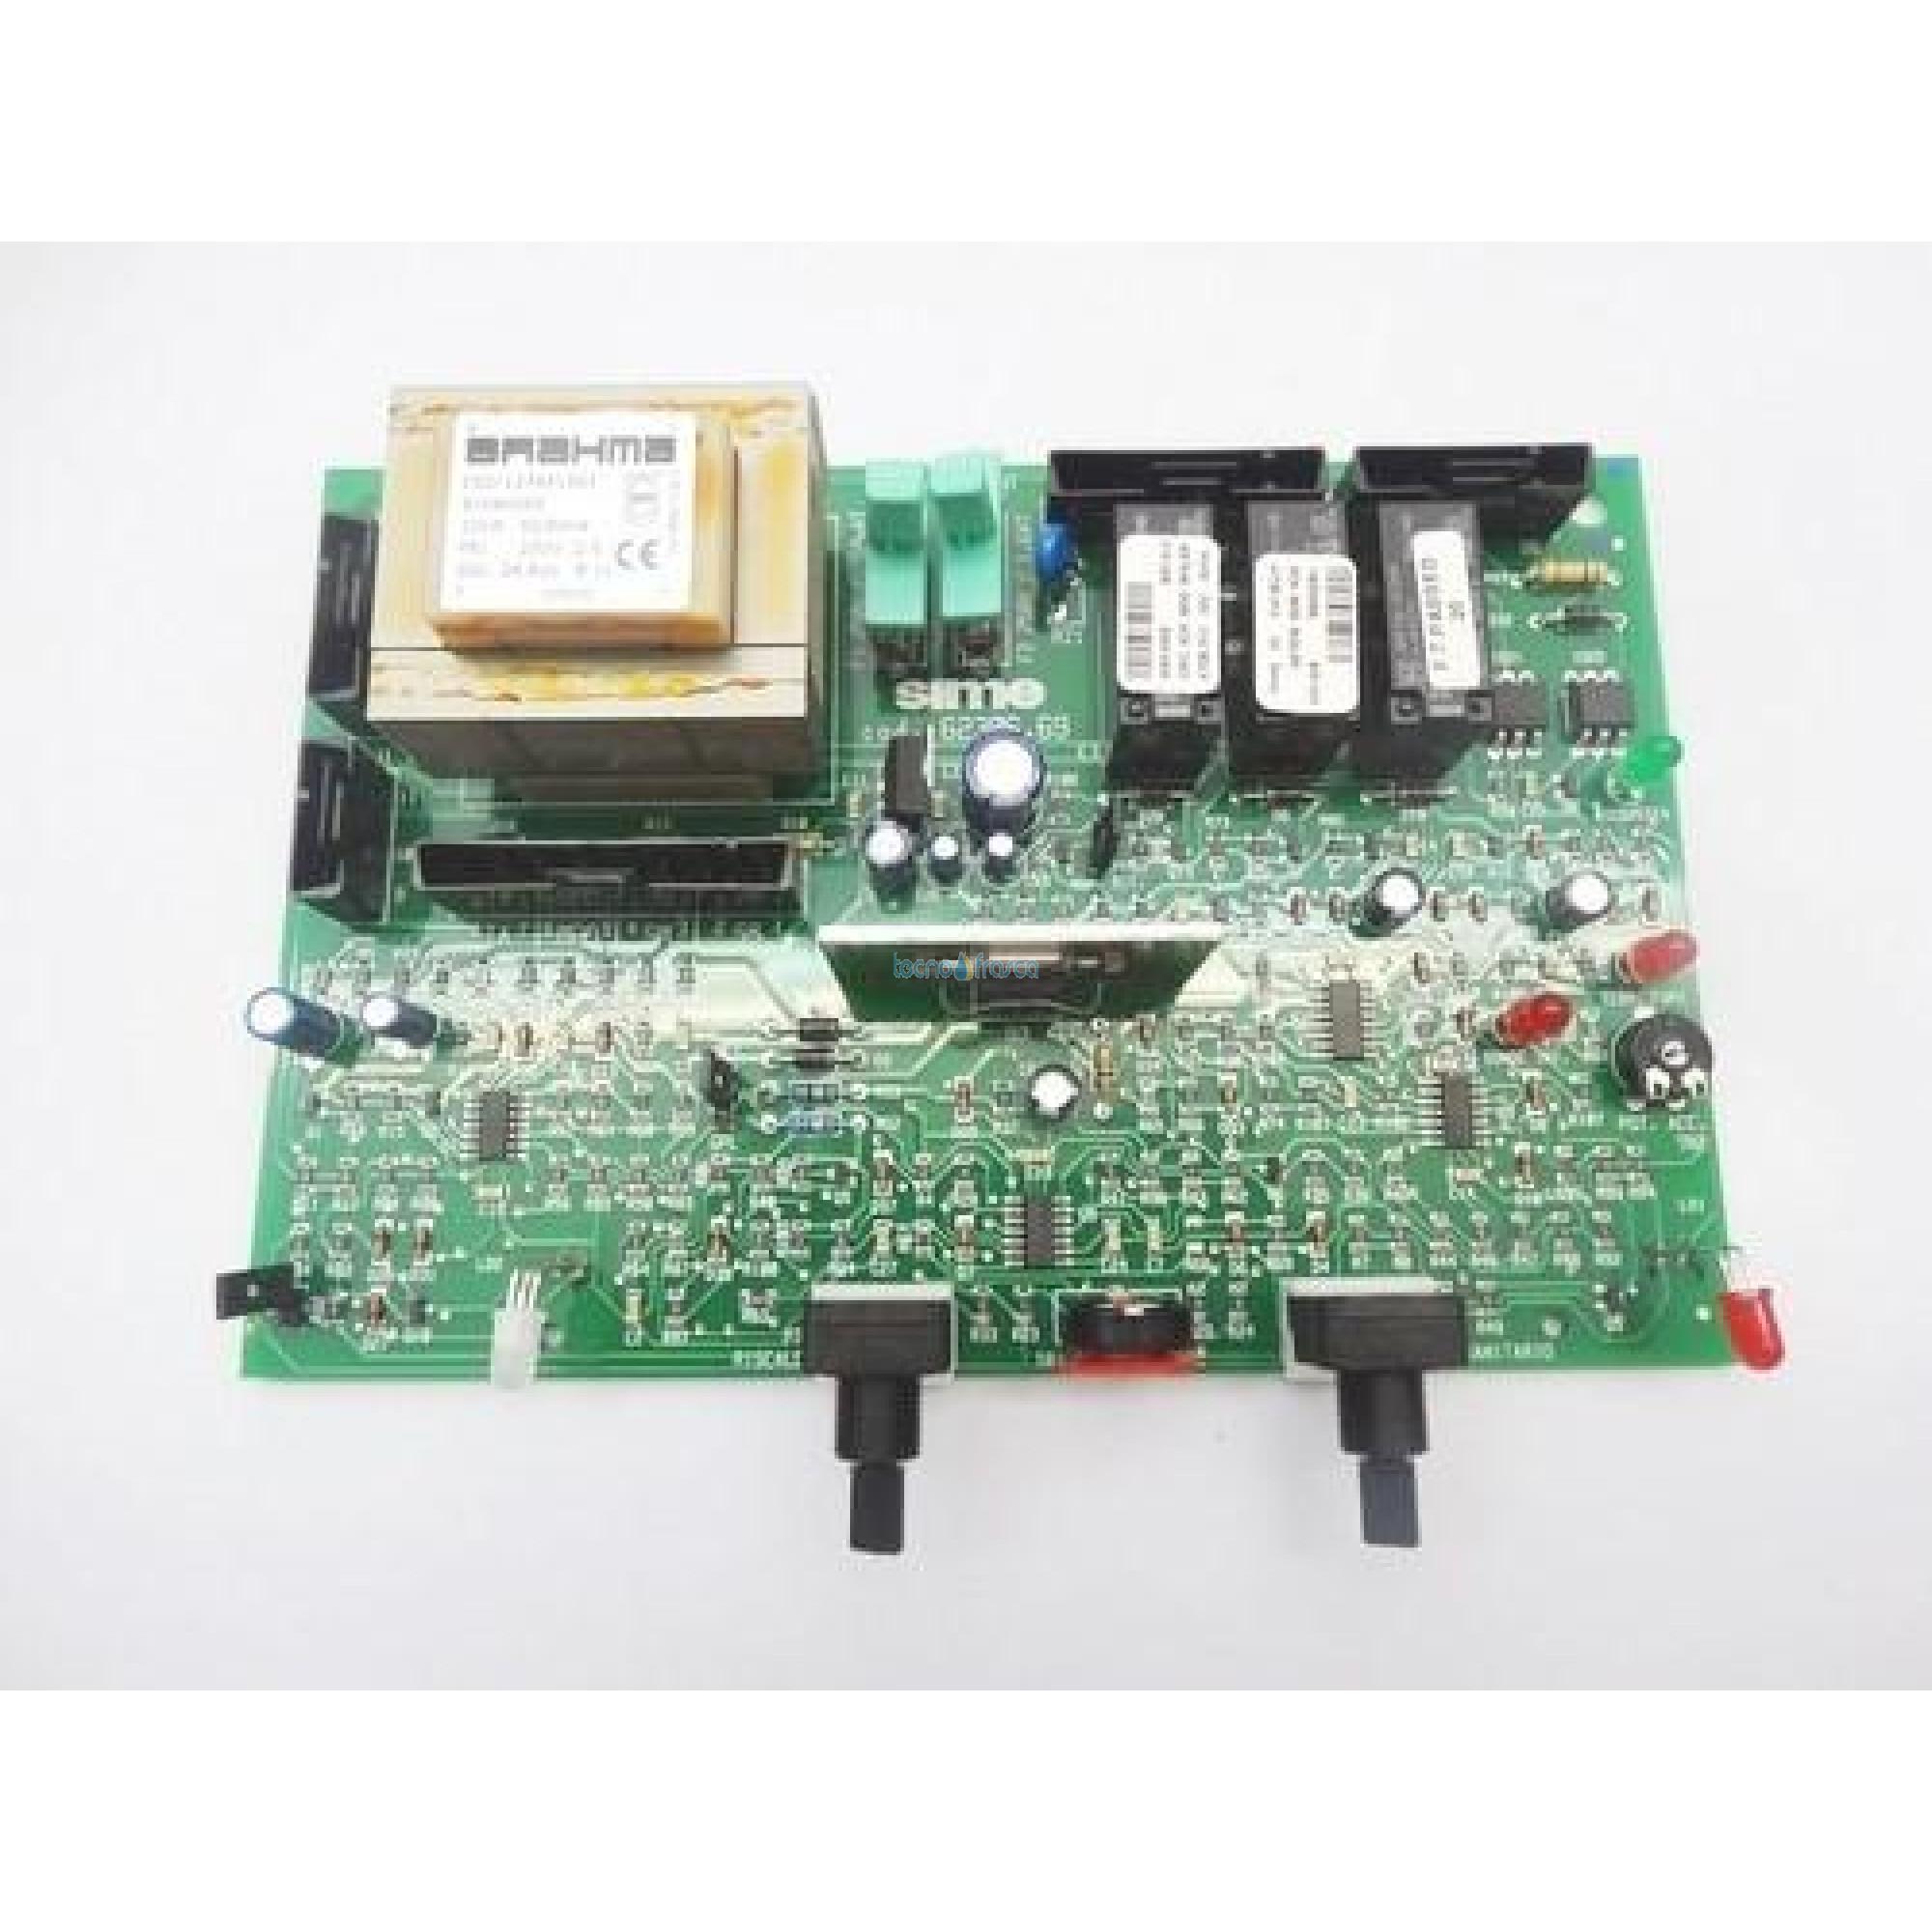 Sime scheda elettronica 24v m.lux bn murella 6230669